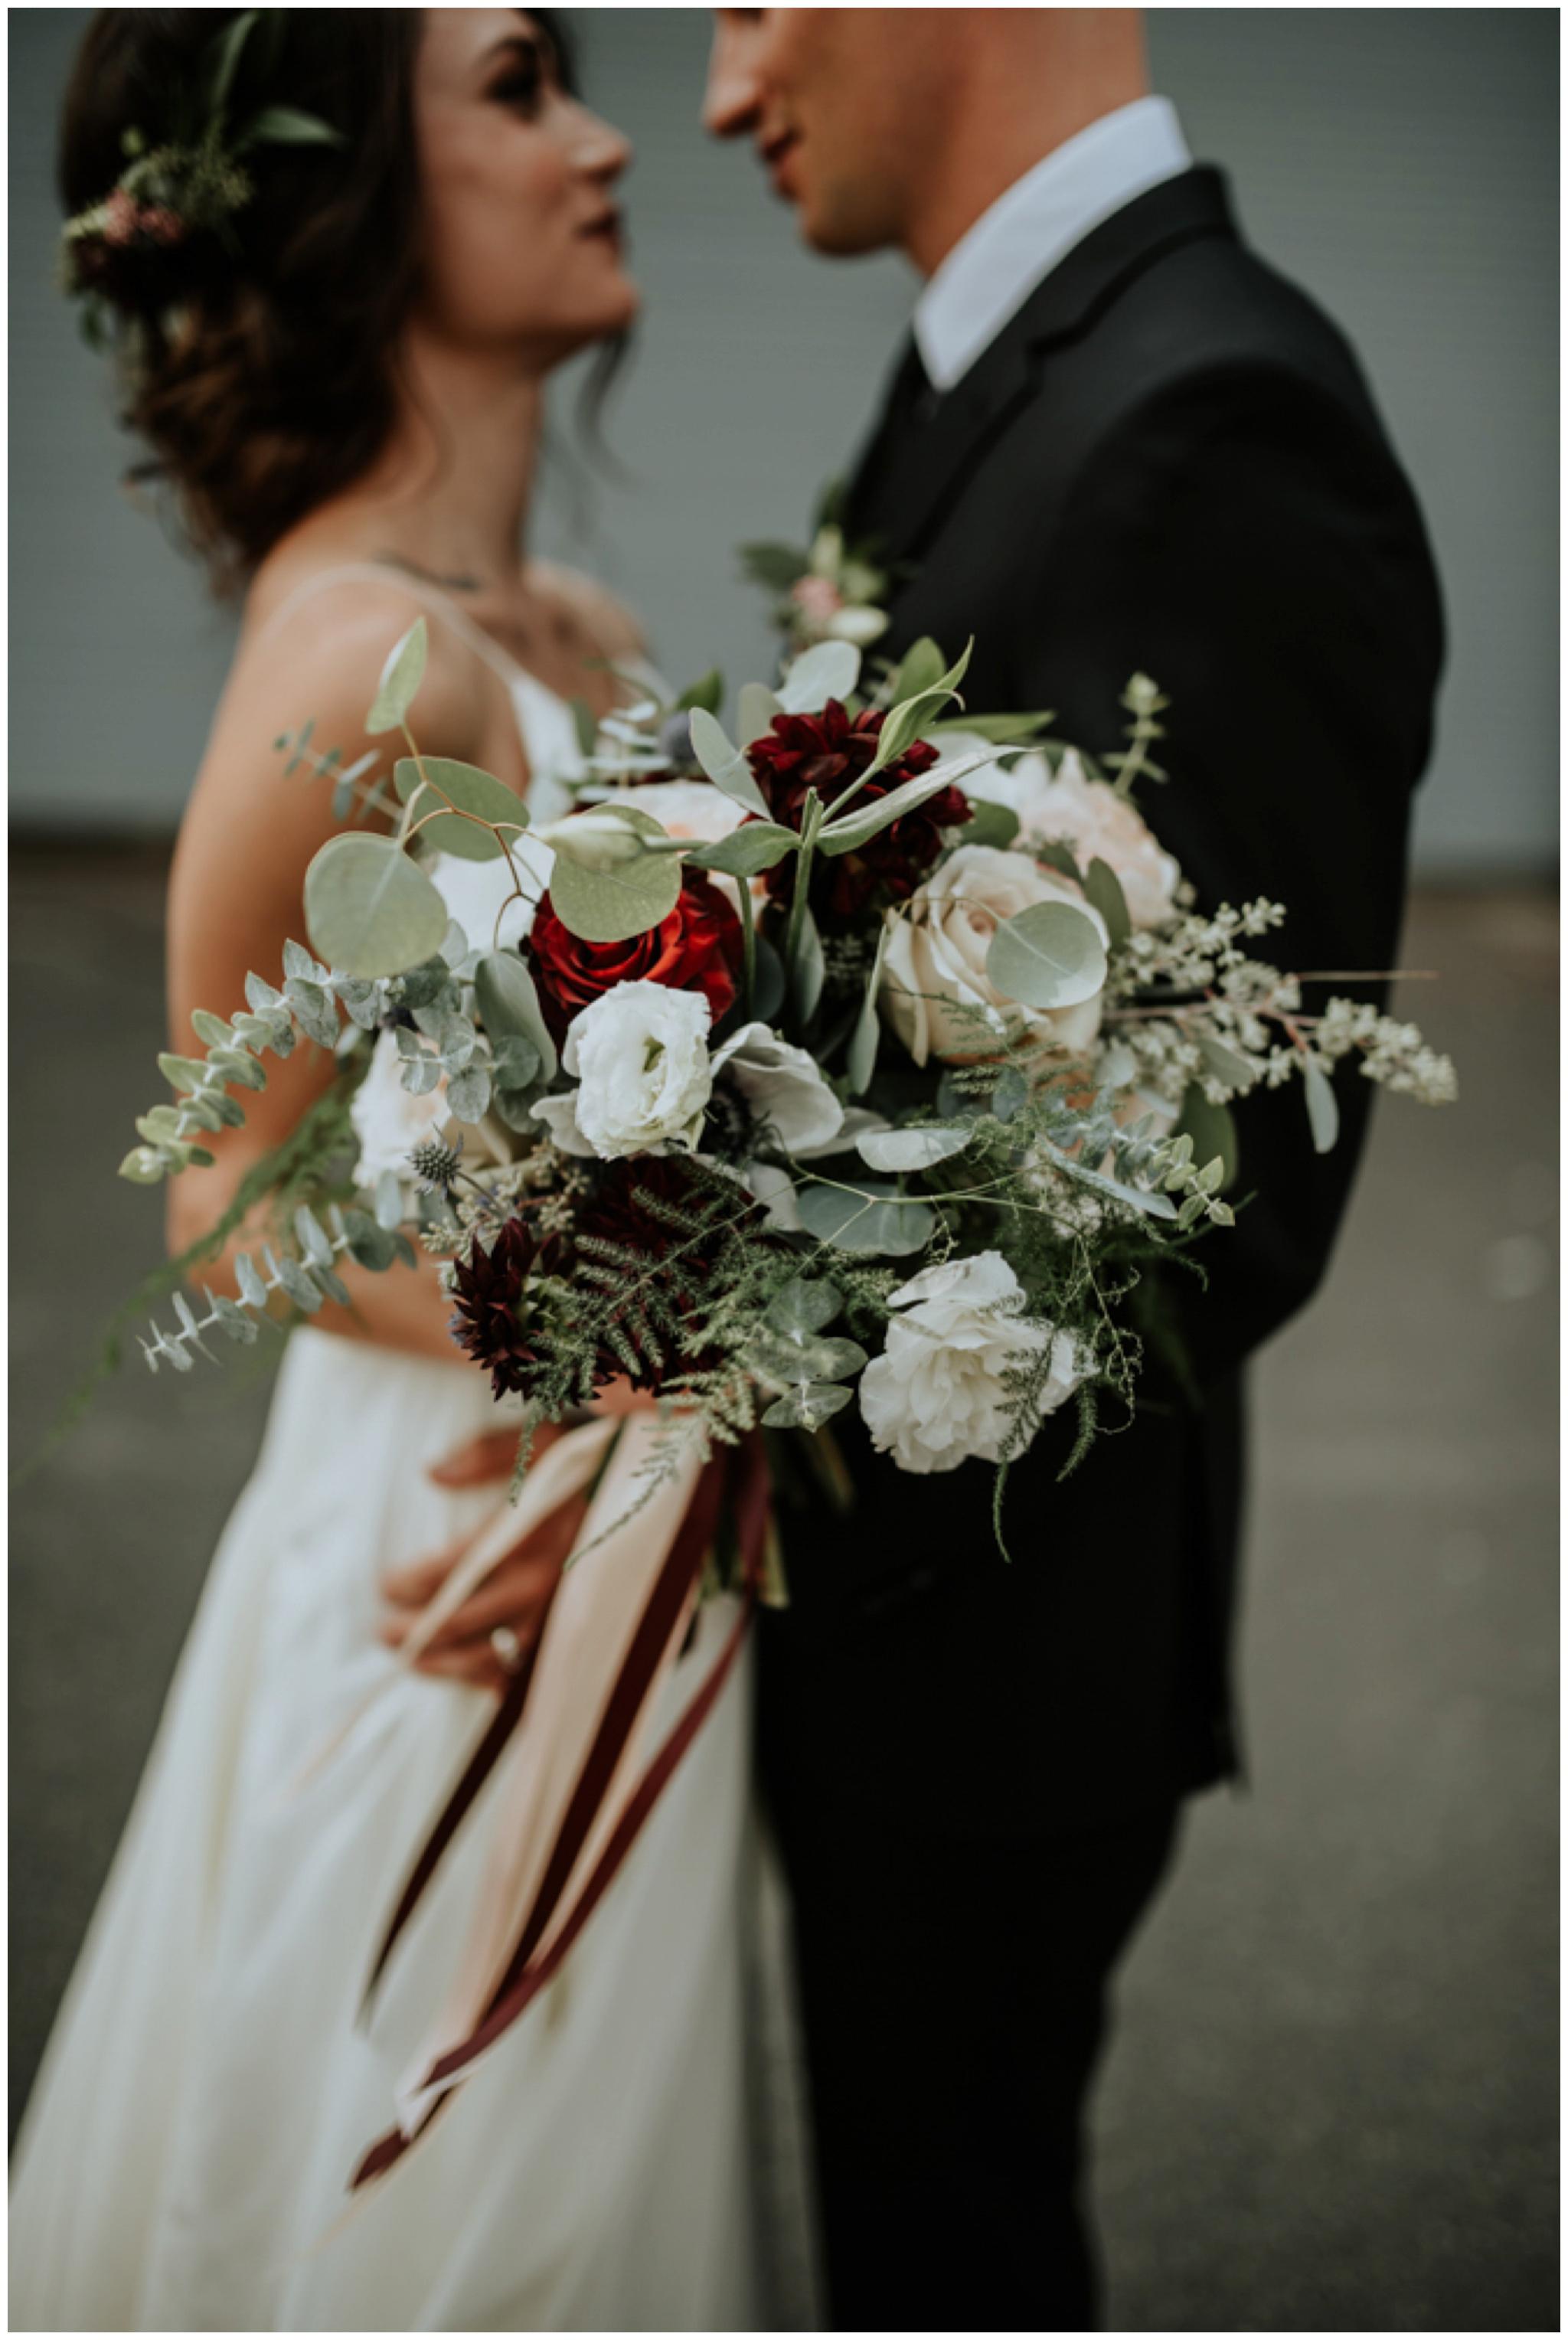 alyssa-keiran-westland-distillery-urban-seattle-wedding-photographer-caitlyn-nikula-63.jpg